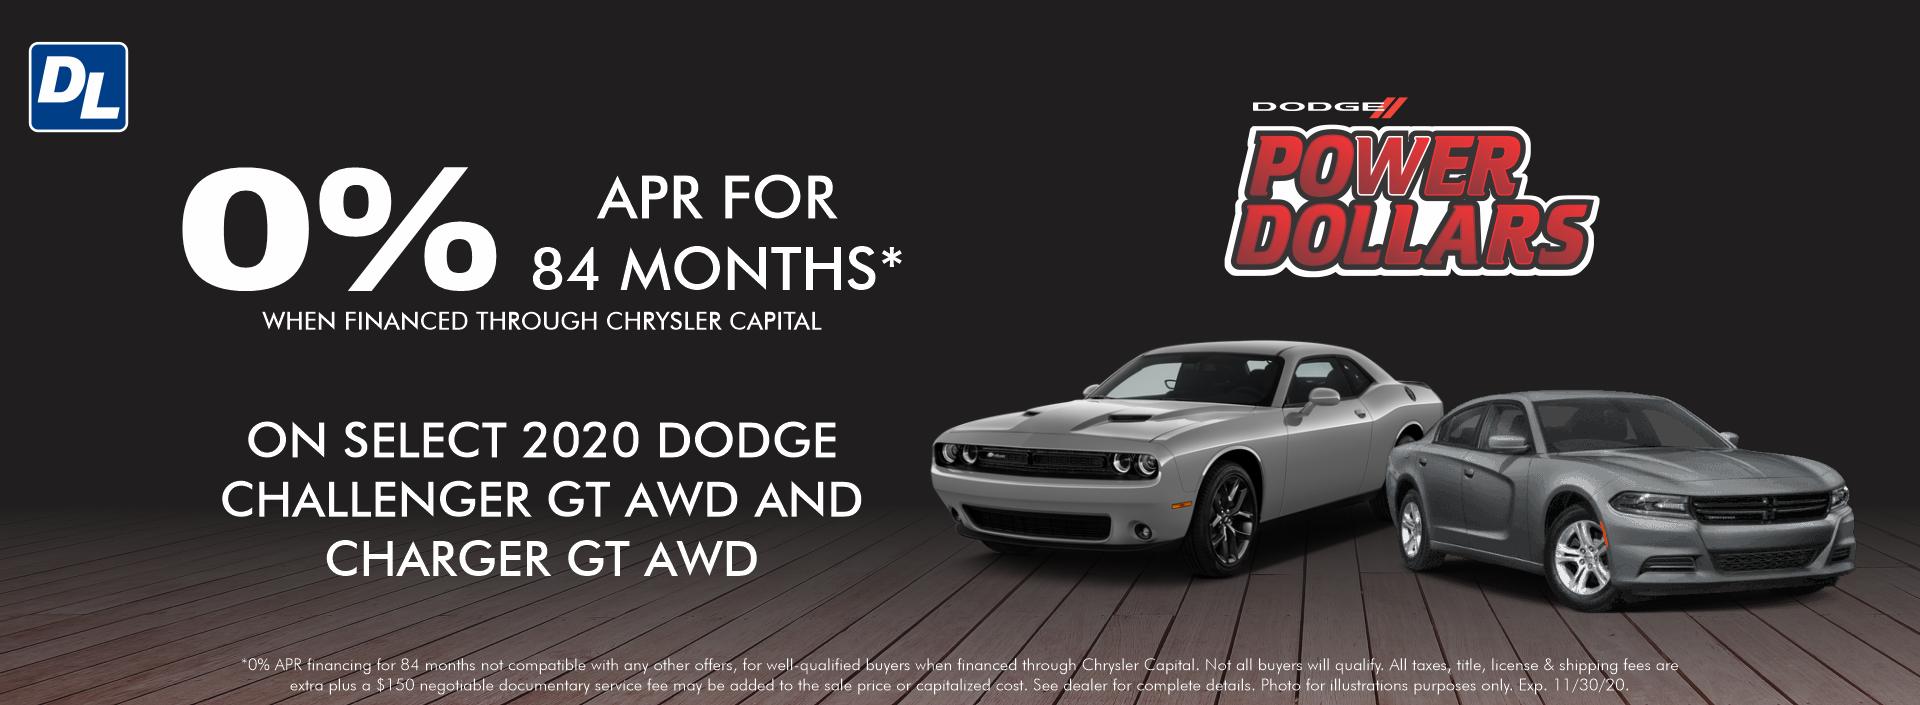 2020NovBanners-CDJR-Dodge